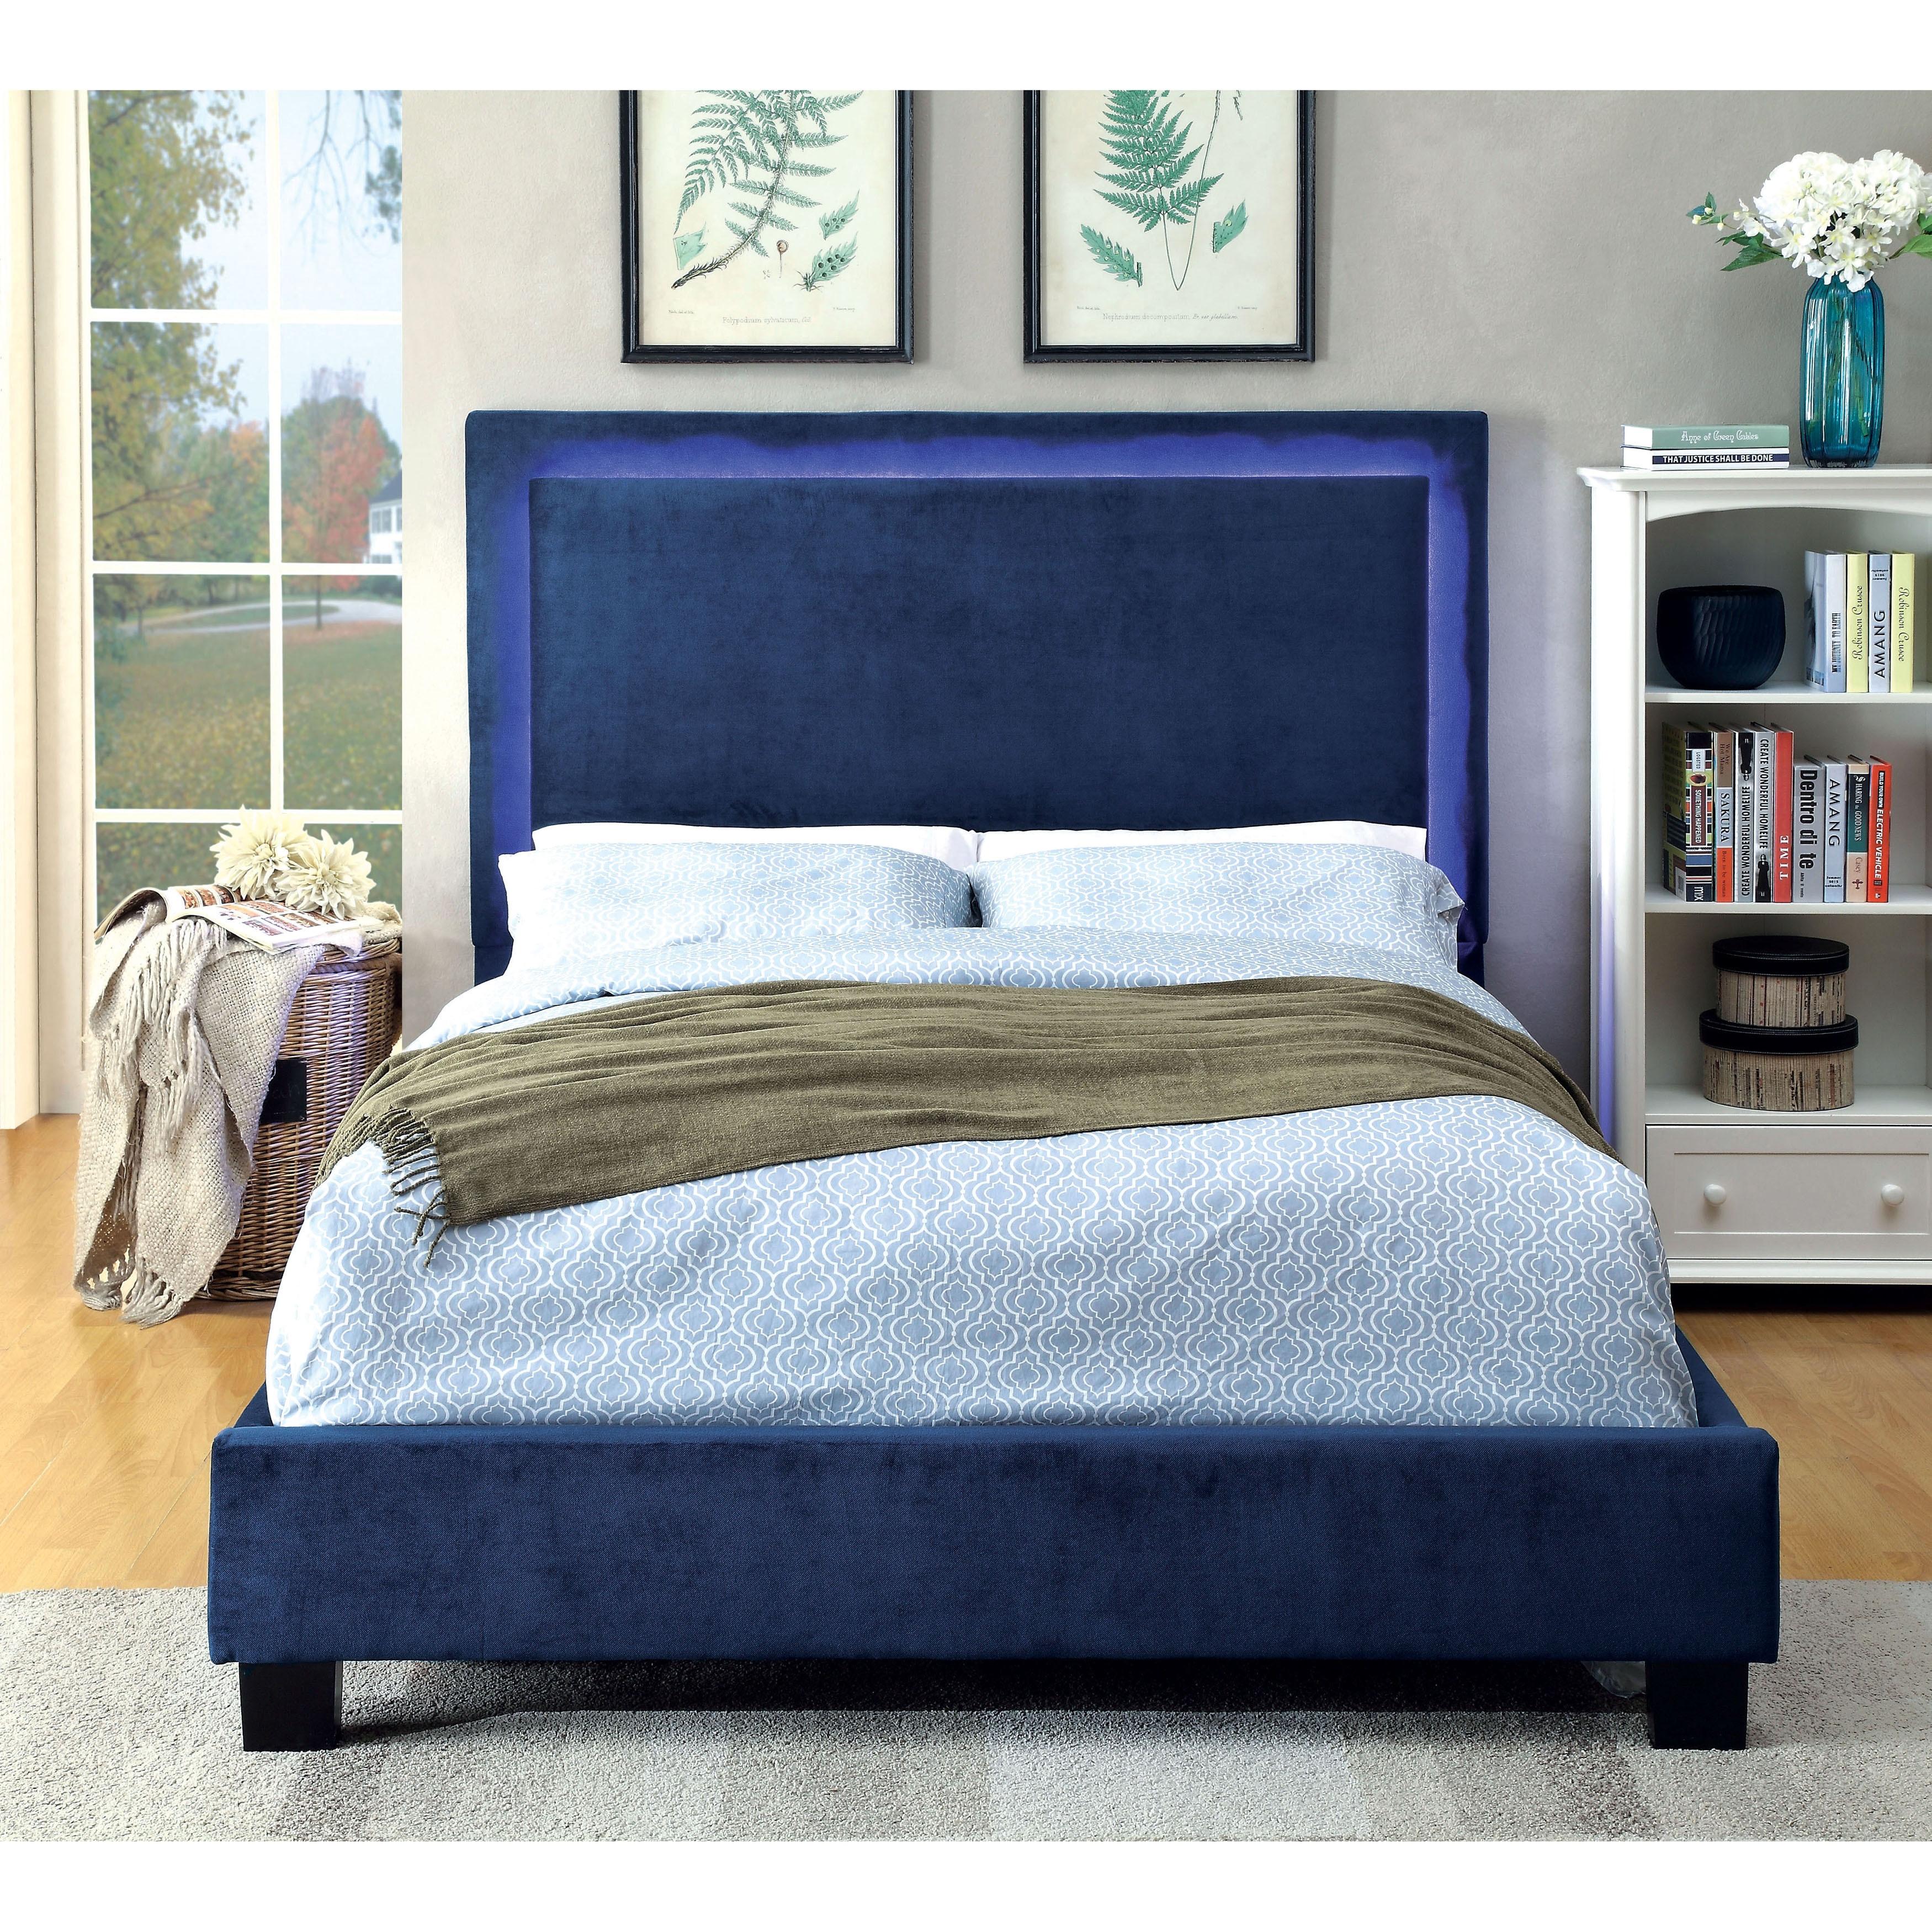 bed pdp ca reviews wayfair ebern furniture platform camacho designs